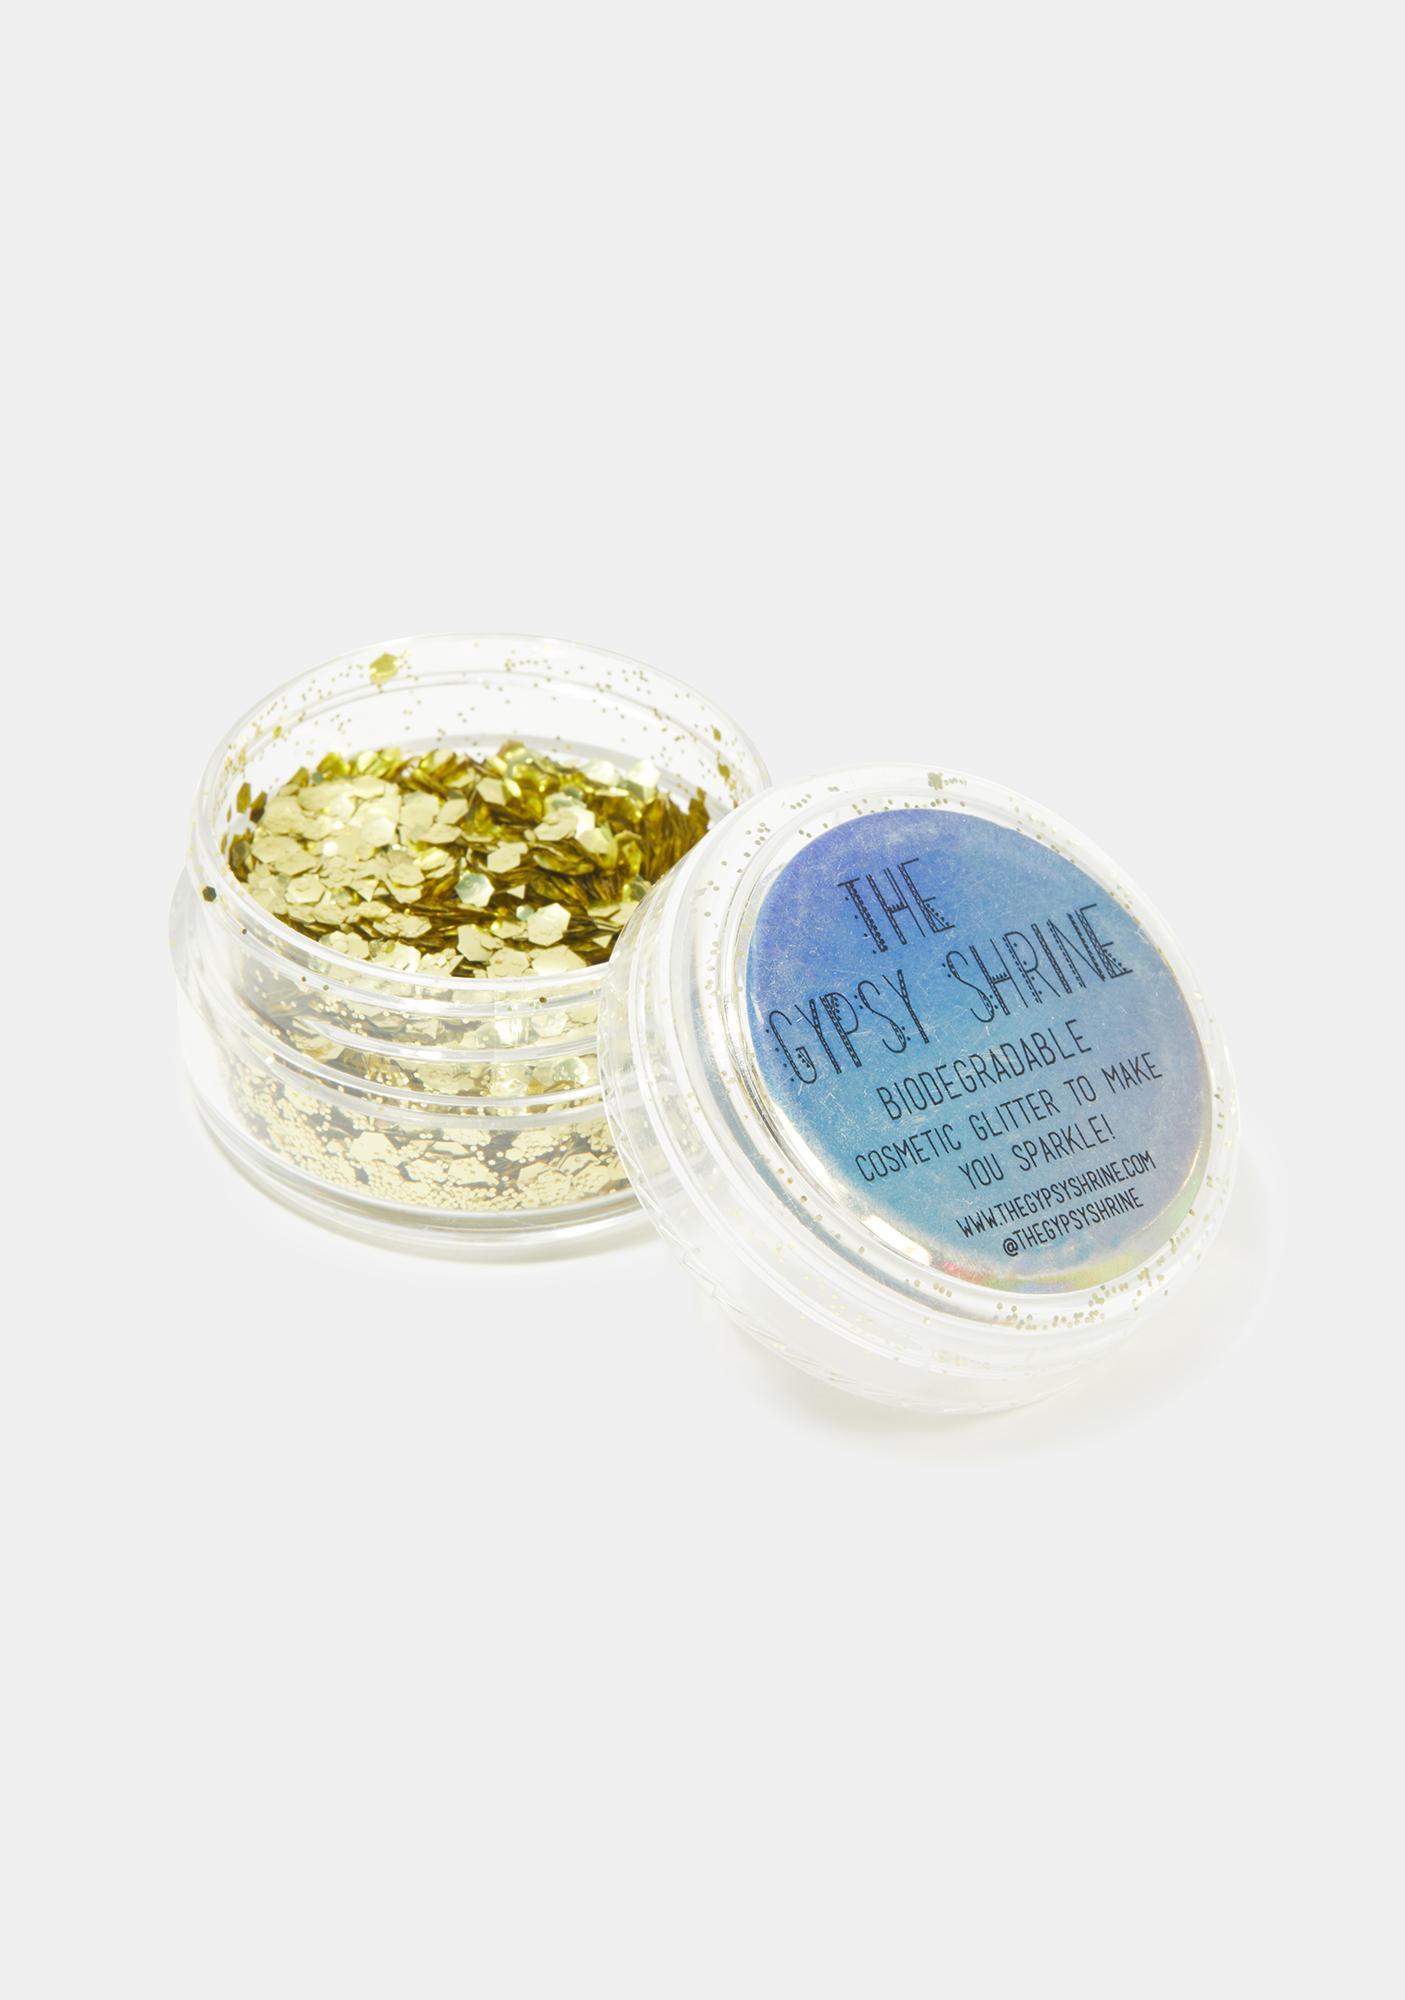 SHRINE Holographic Gold Biodegradable Chunky Glitter